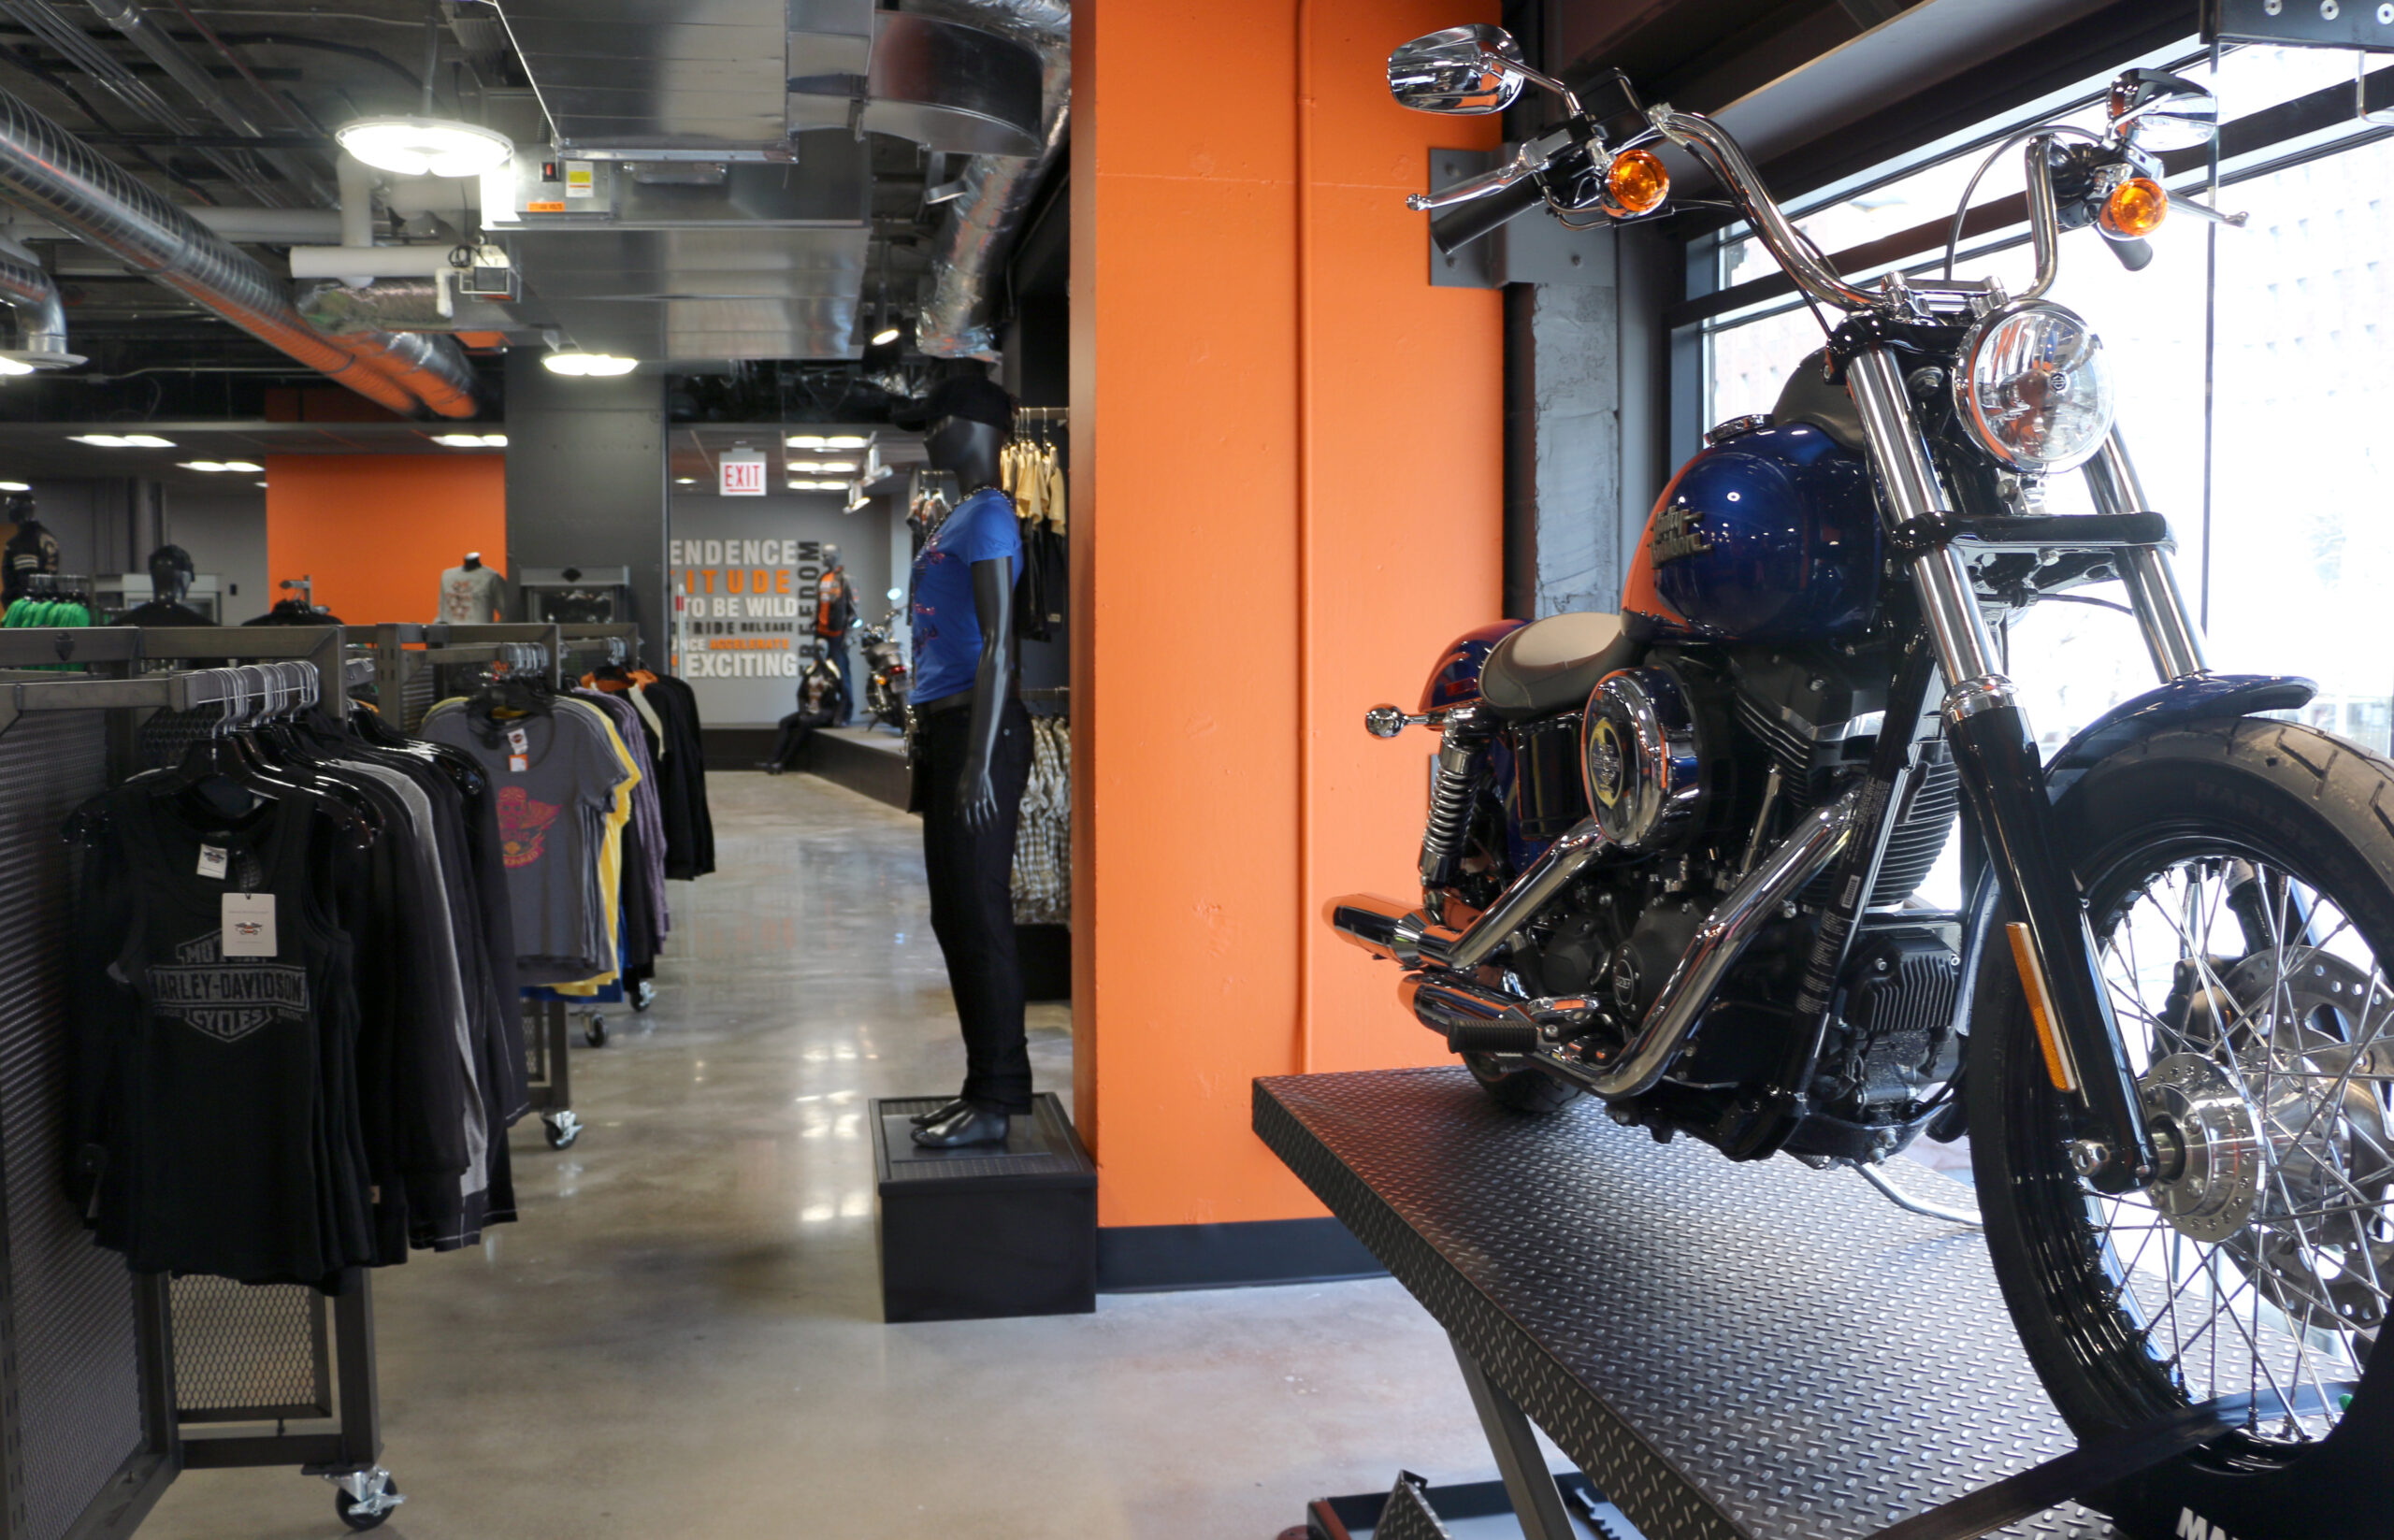 Displays at Harley Davidson.